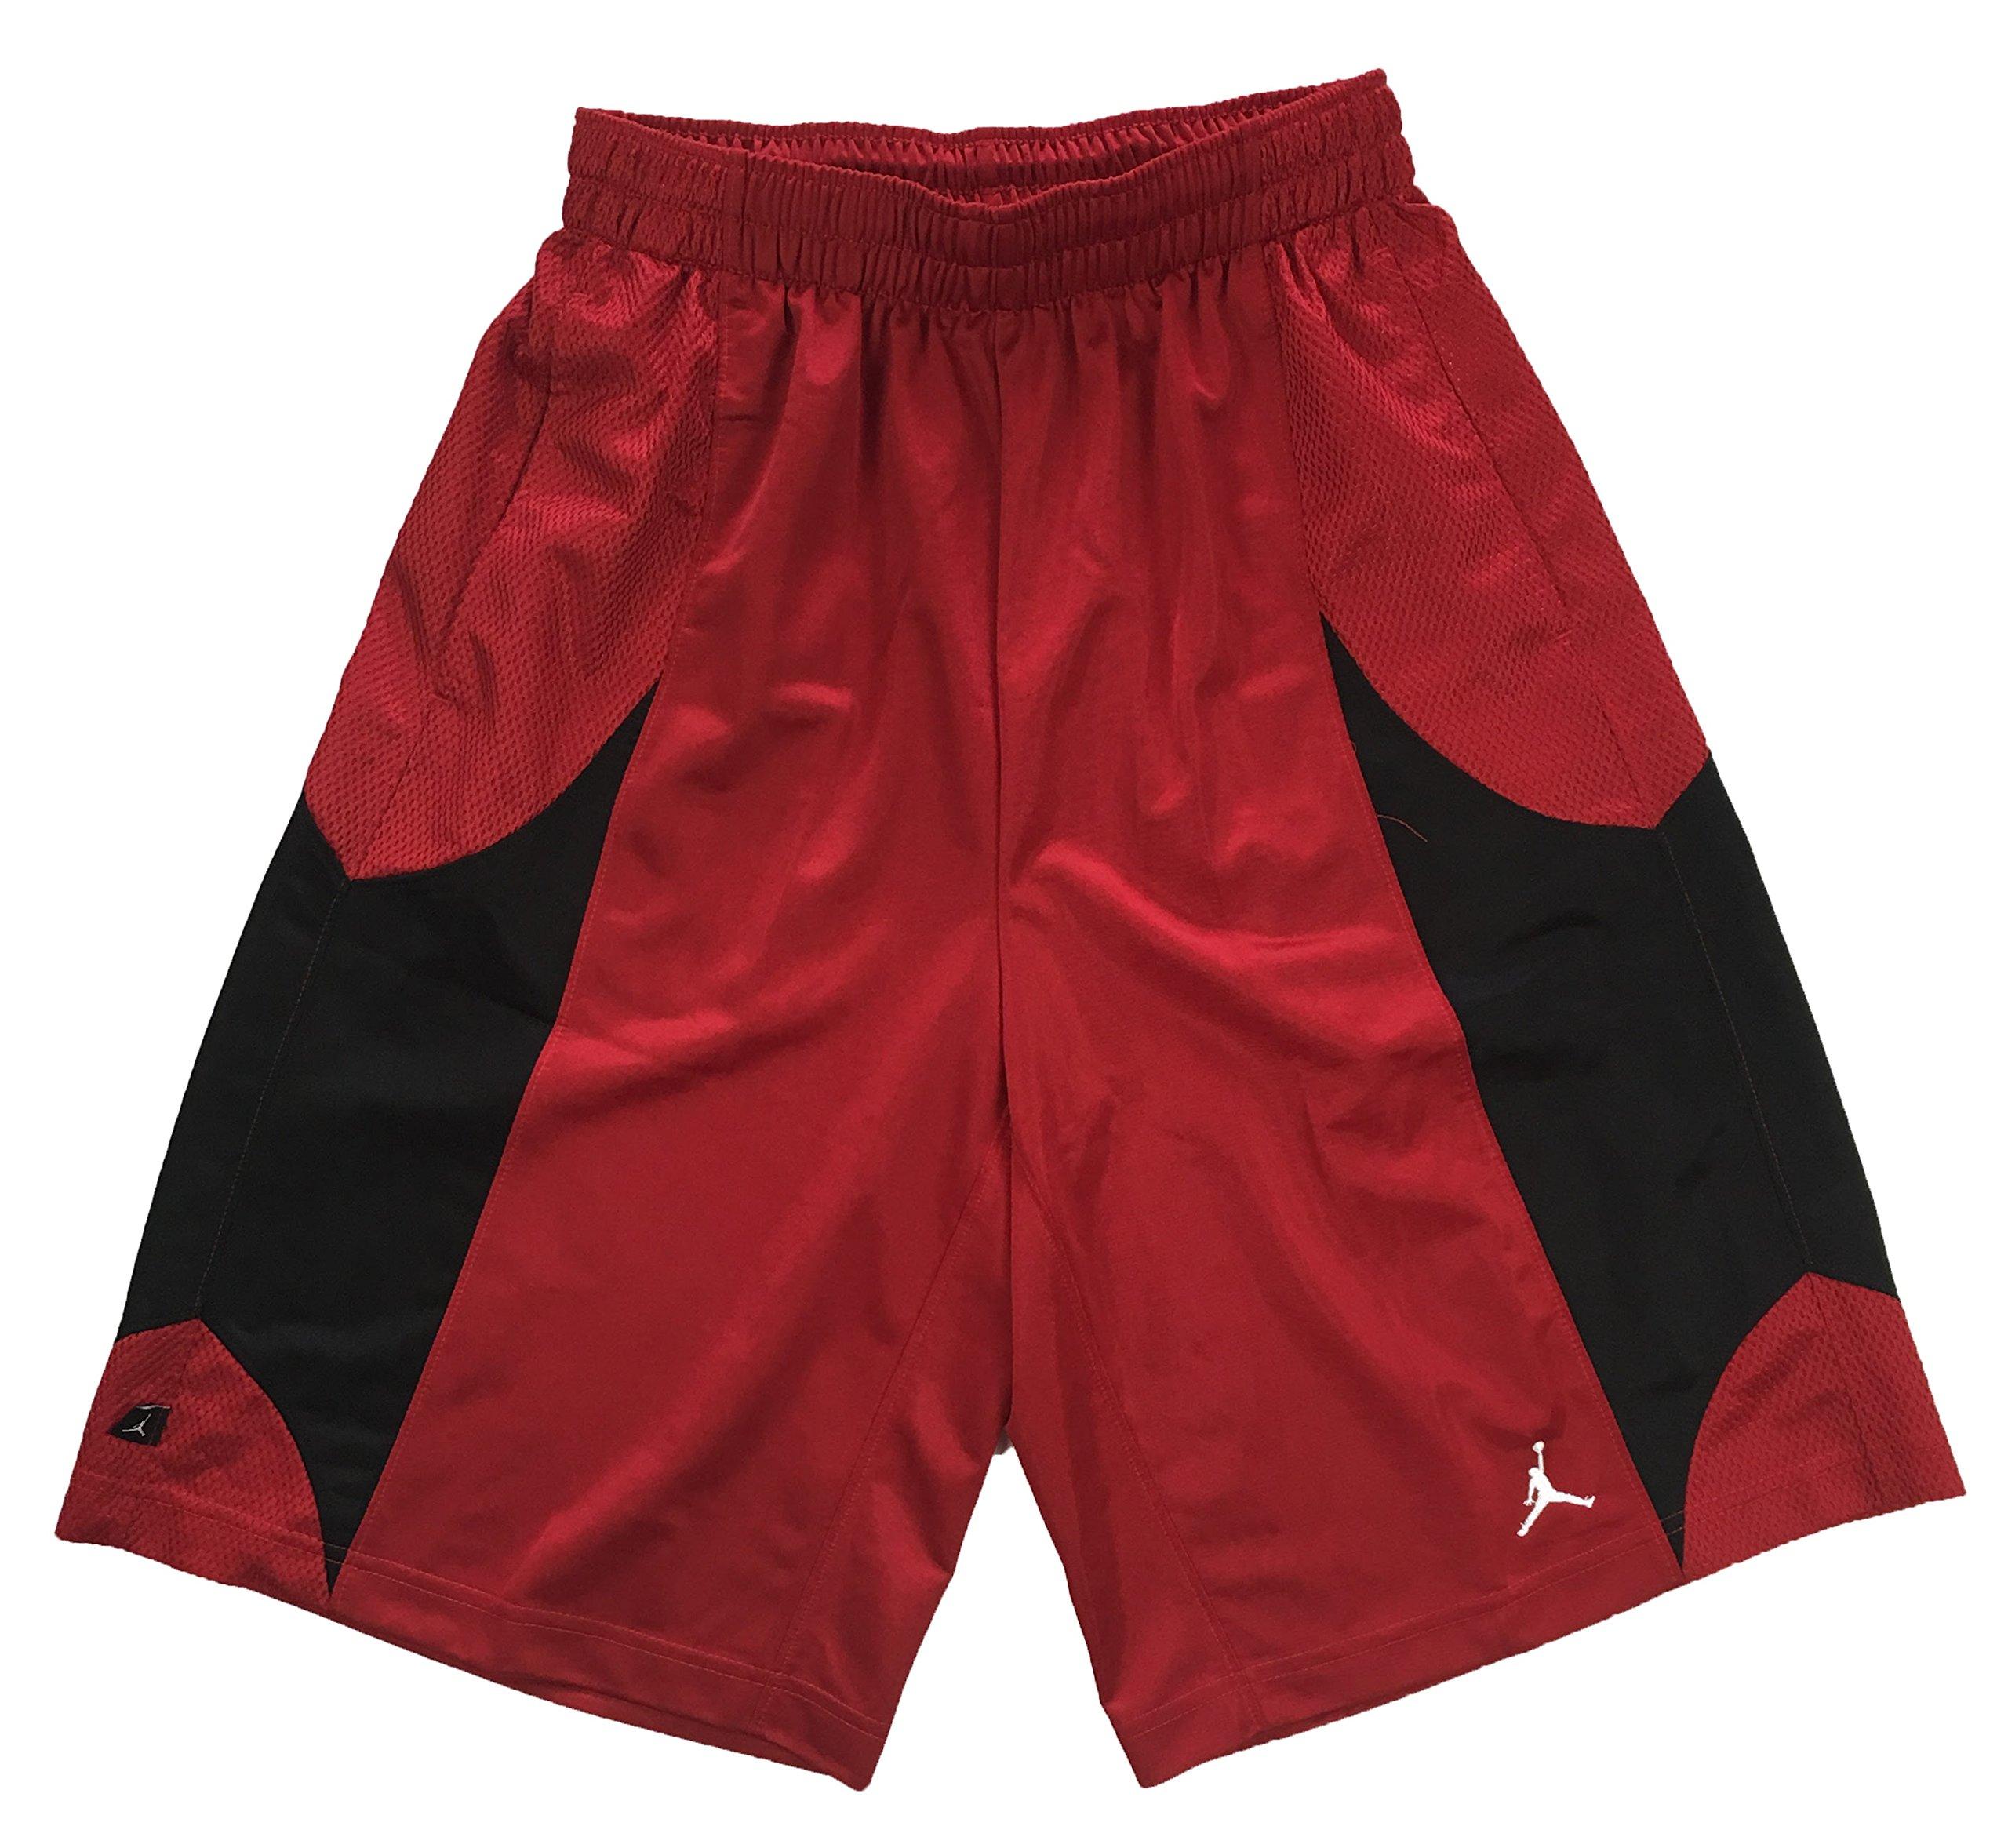 c70de0568719 Galleon - Nike Air Jordan Mens Durasheen Jumpman Basketball Shorts  Red Black (M)